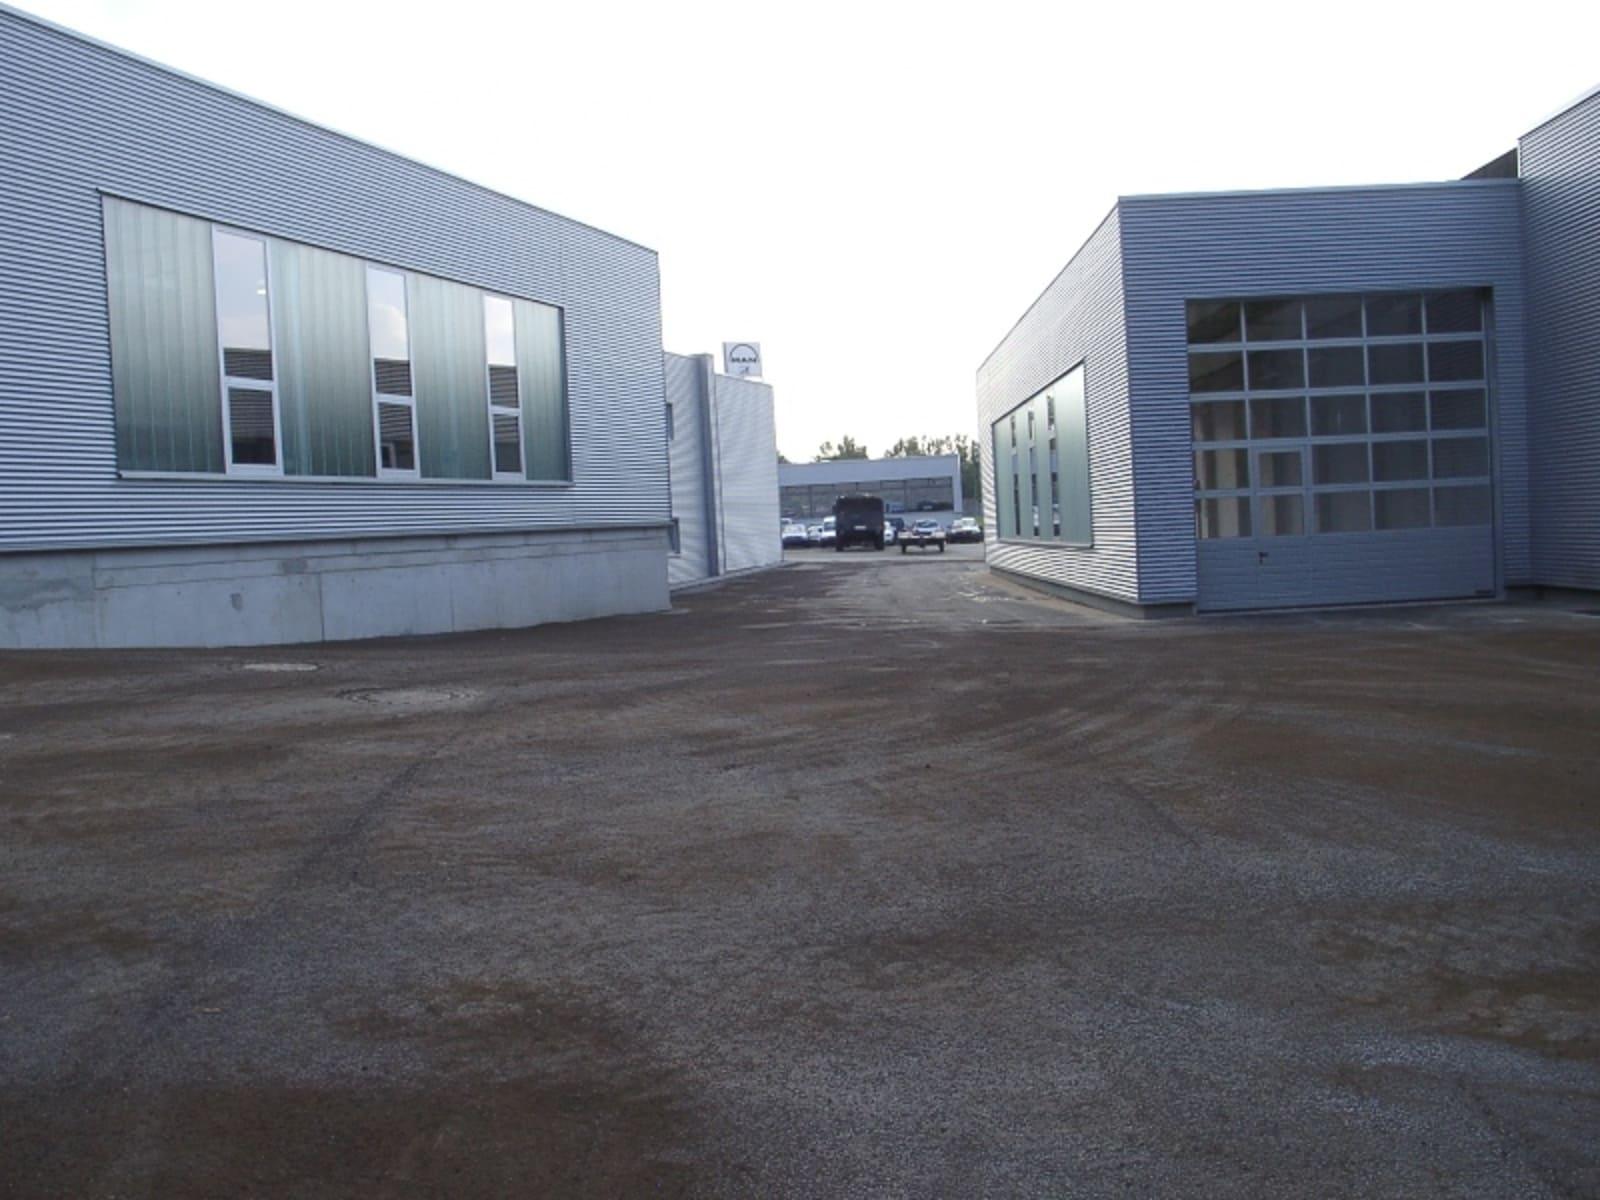 Autohaus Moeller